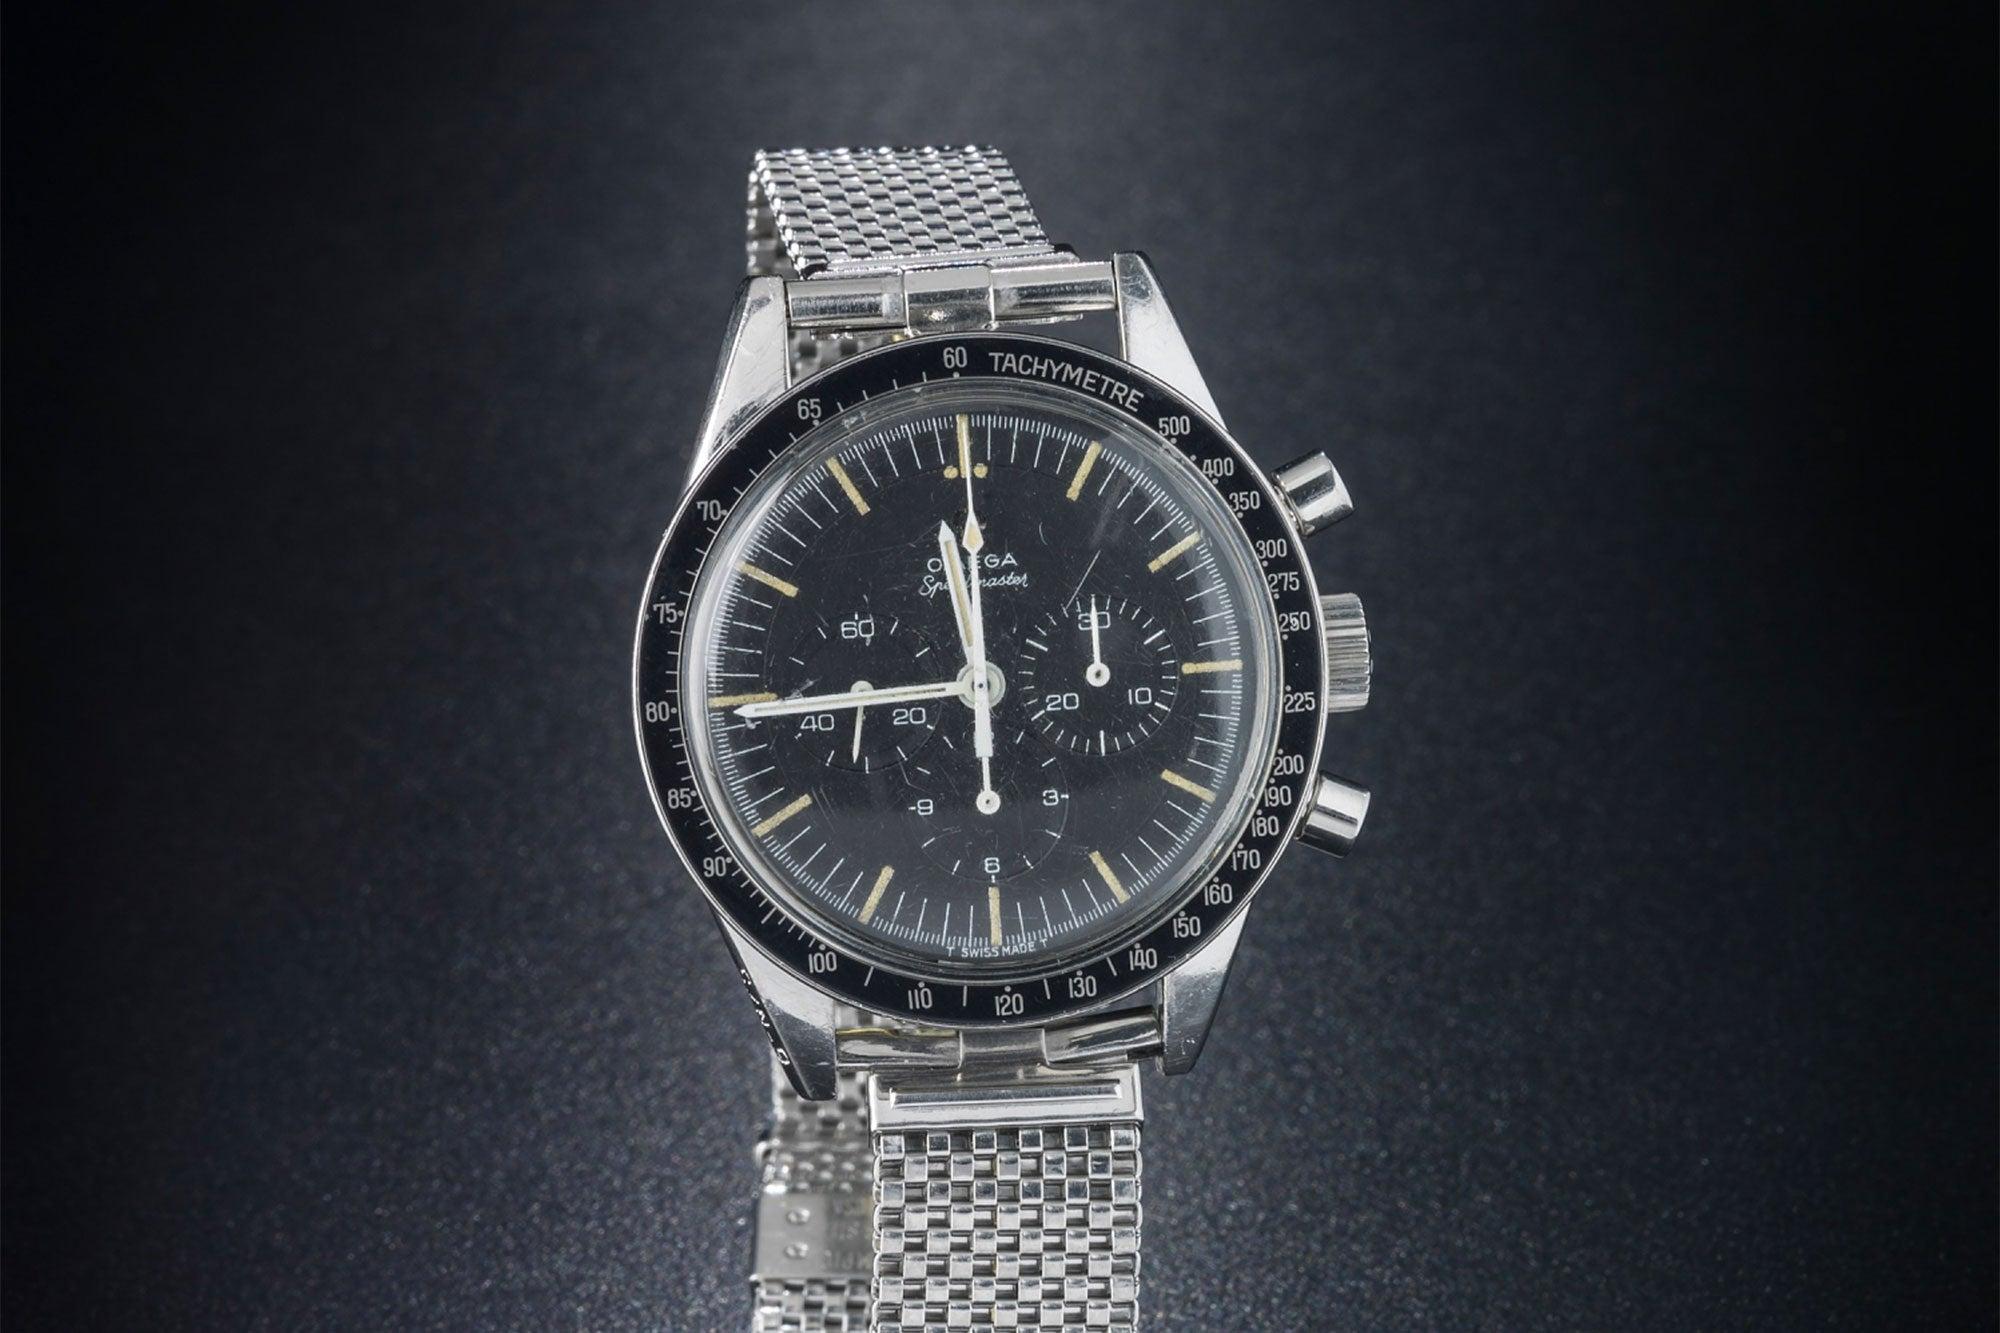 4e705441729 The Omega Speedmaster worn by Astronaut Gordon Cooper